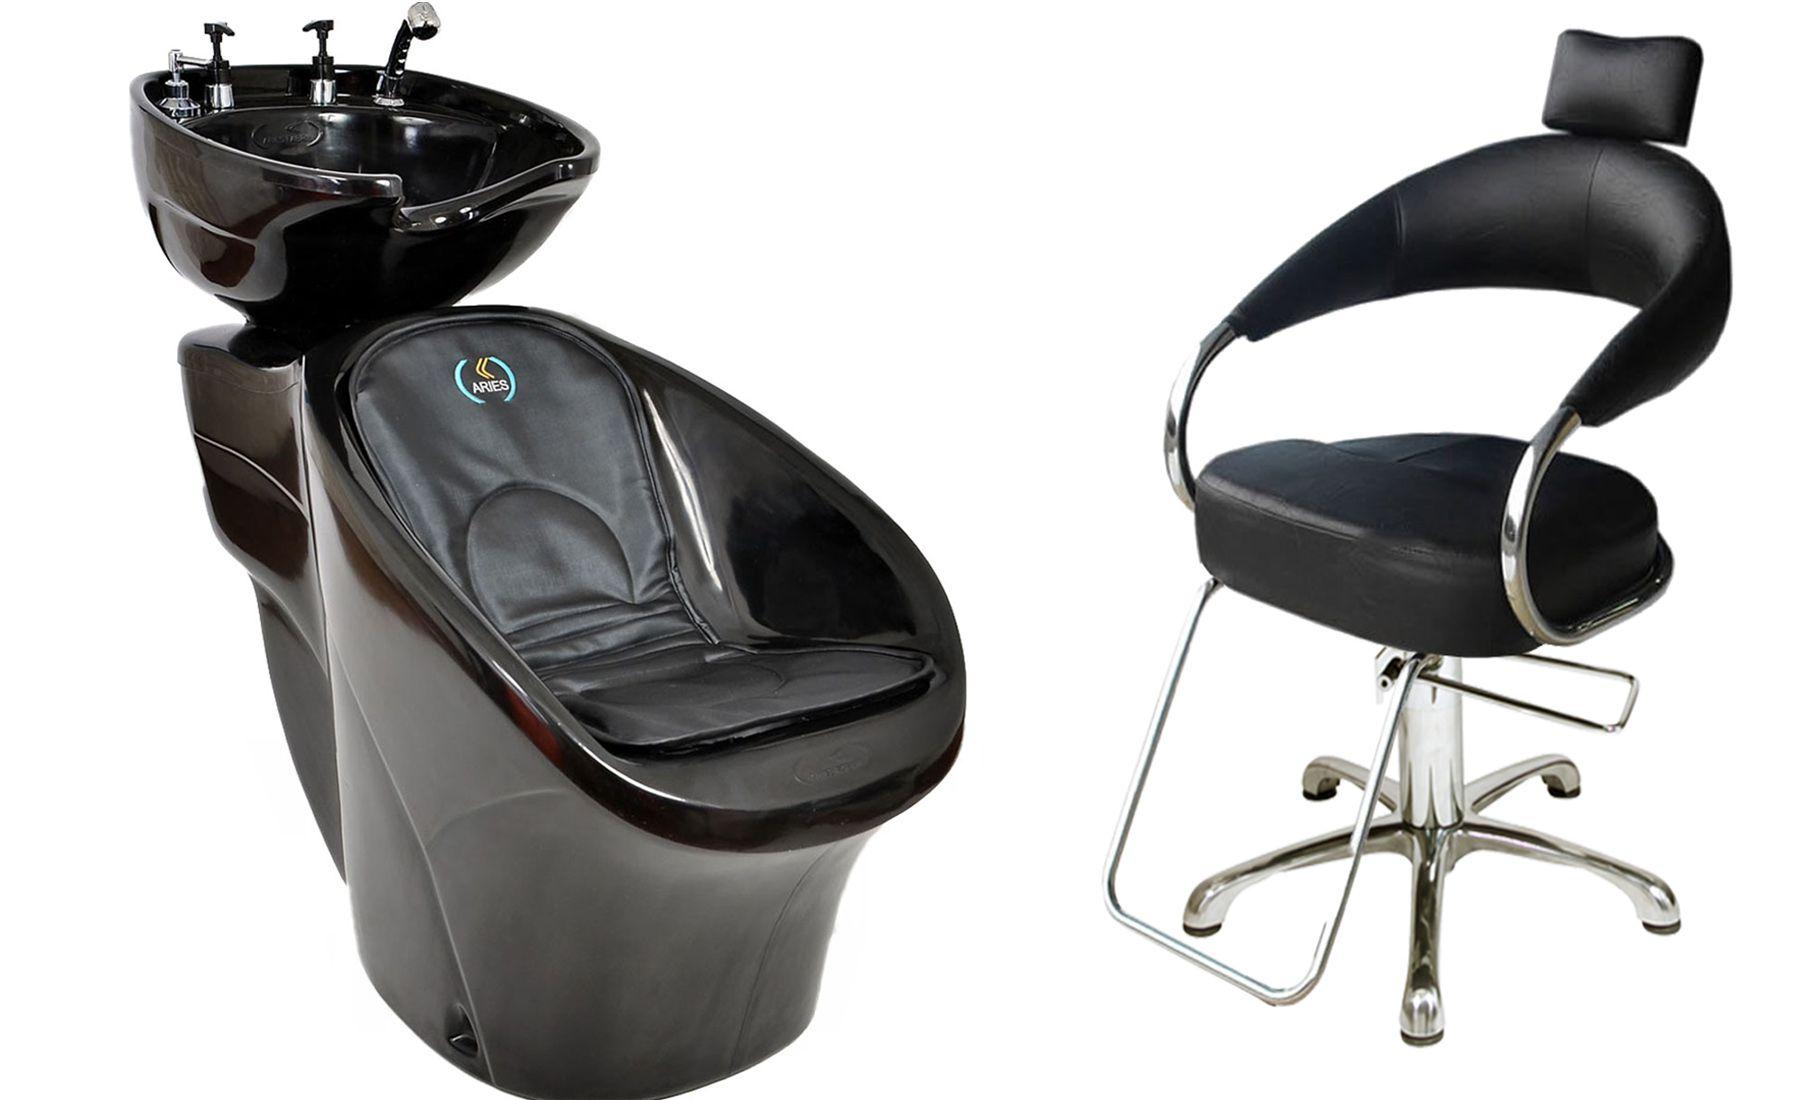 Lavatório Chic L-50 + Cadeira Hidráulica Futurama